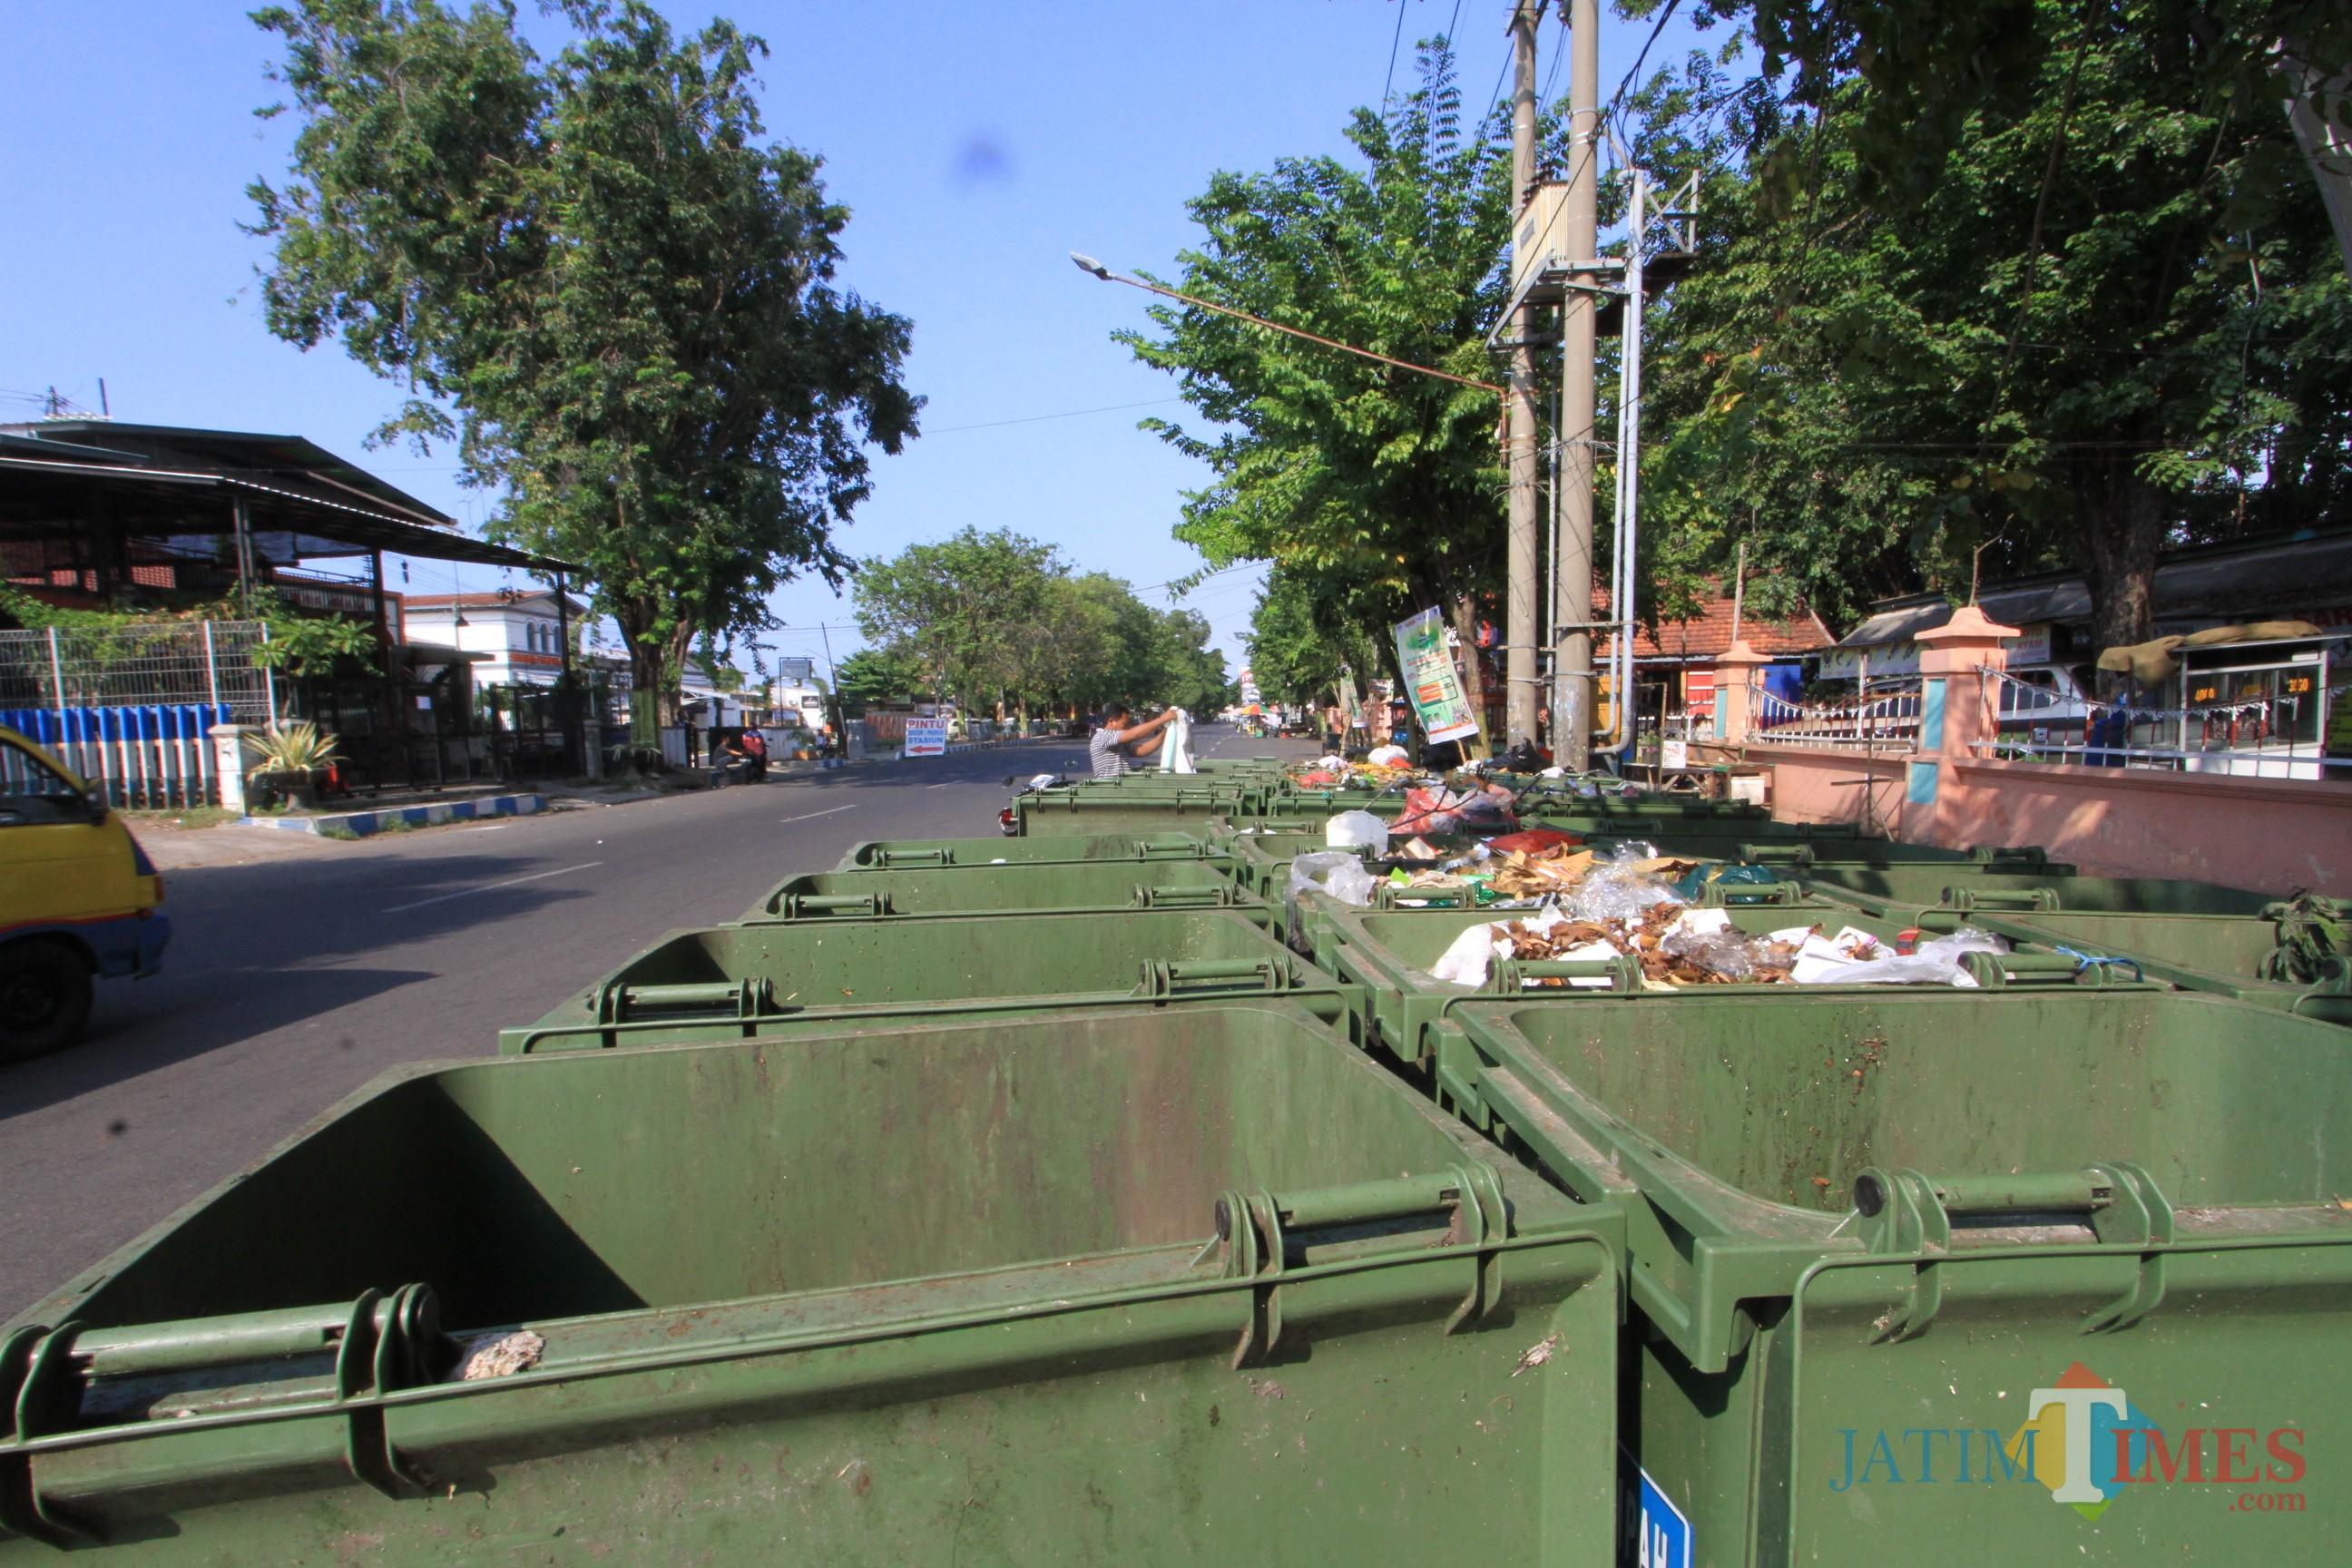 Inilah TPS di utara alun-alun Kota Probolinggo yang dikeluhkan warga dan pemilik warung (Agus Salam/Jatim TIMES)